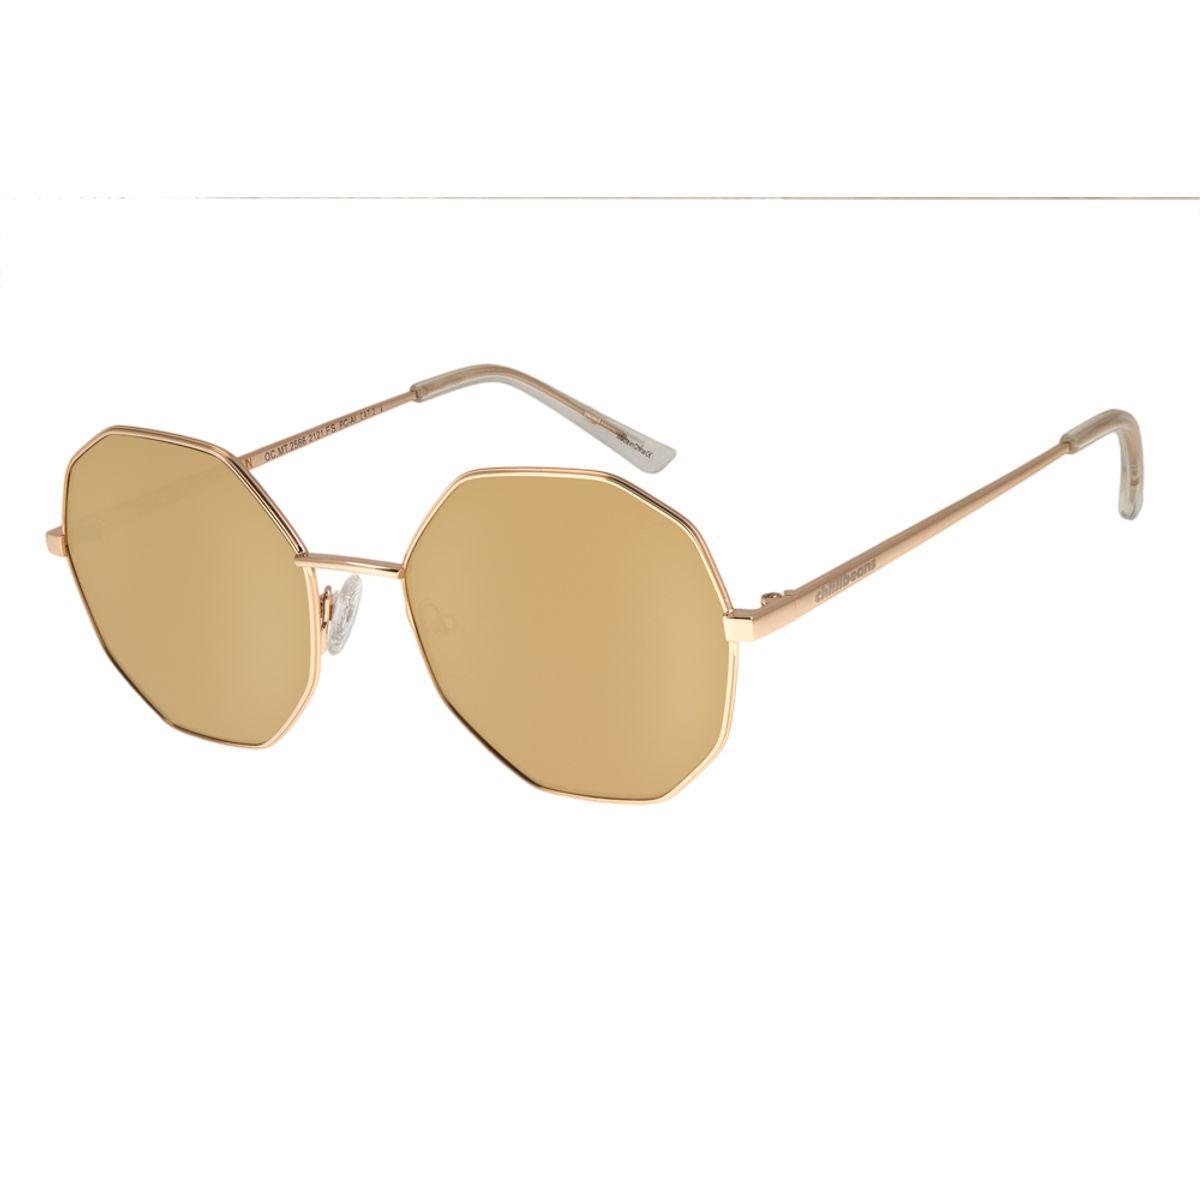 190dfa63aabe5 Óculos de Sol Chilli Beans Feminino Octagonal Dourado 2566 - Chilli ...